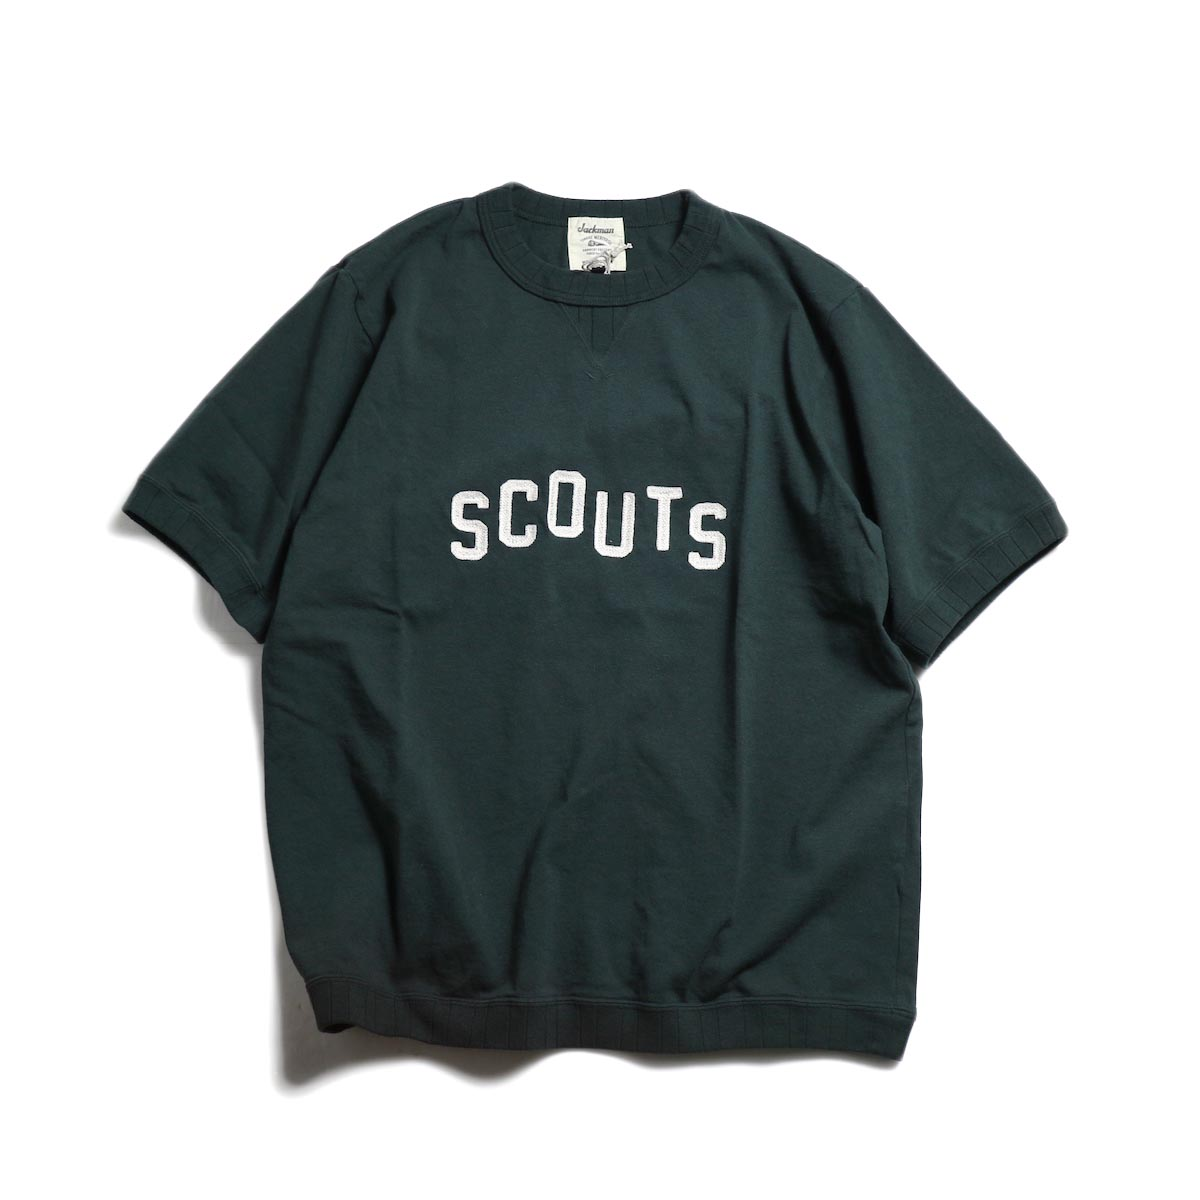 Jackman / Rib T-Shirt (SCOUTS) -Stand Green